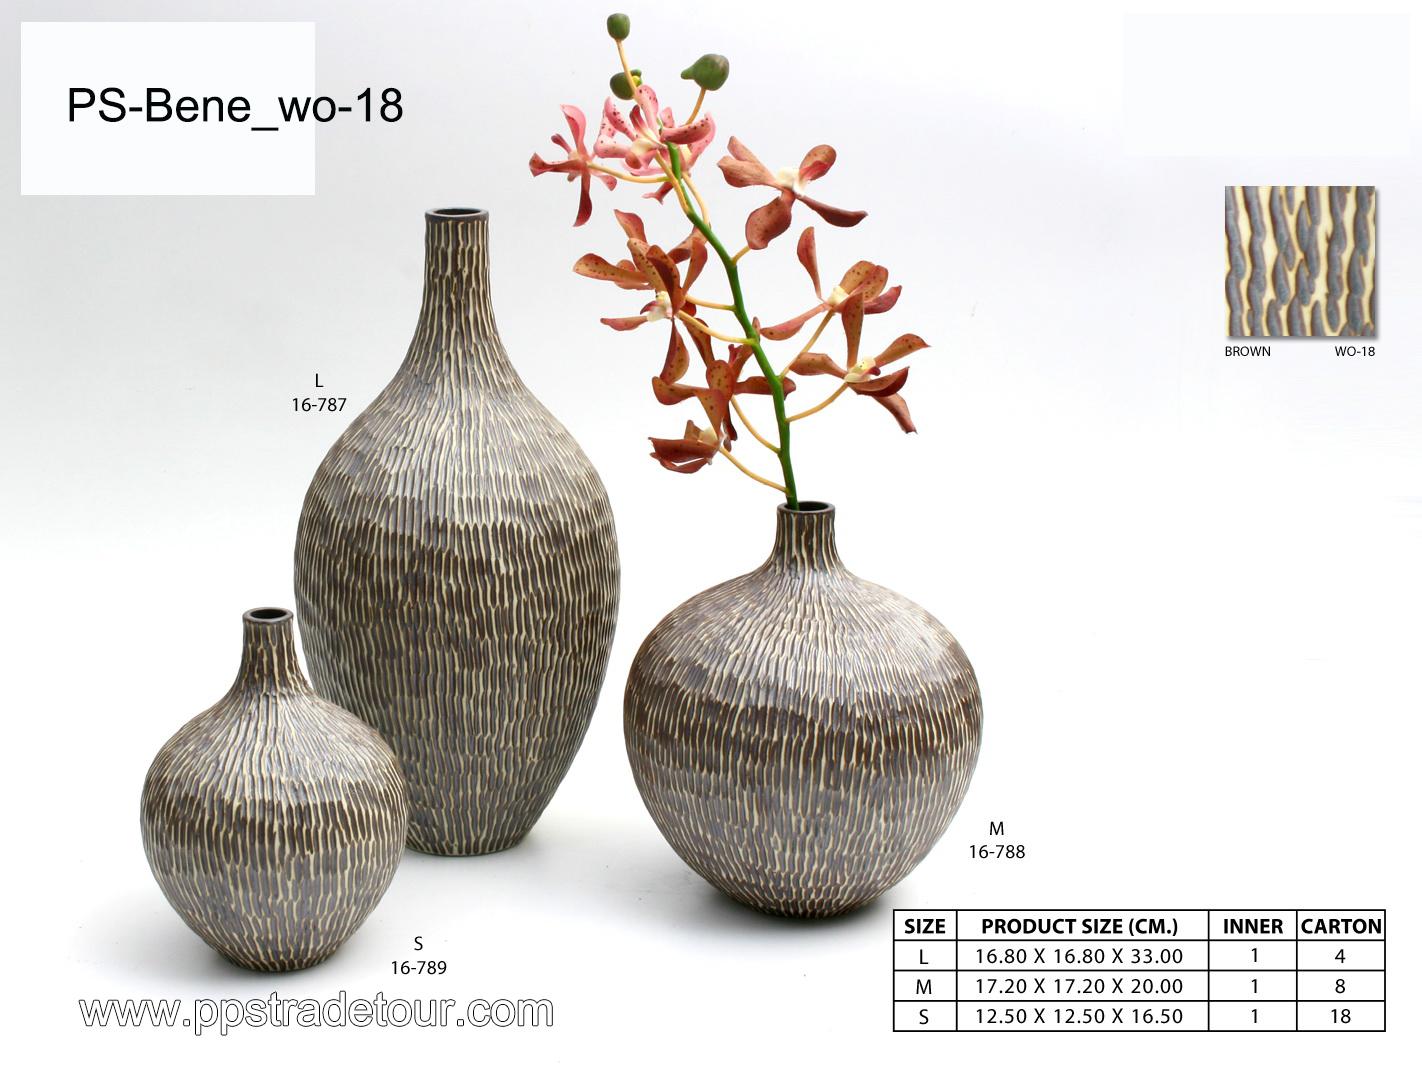 PSCV-Bene_wo-18